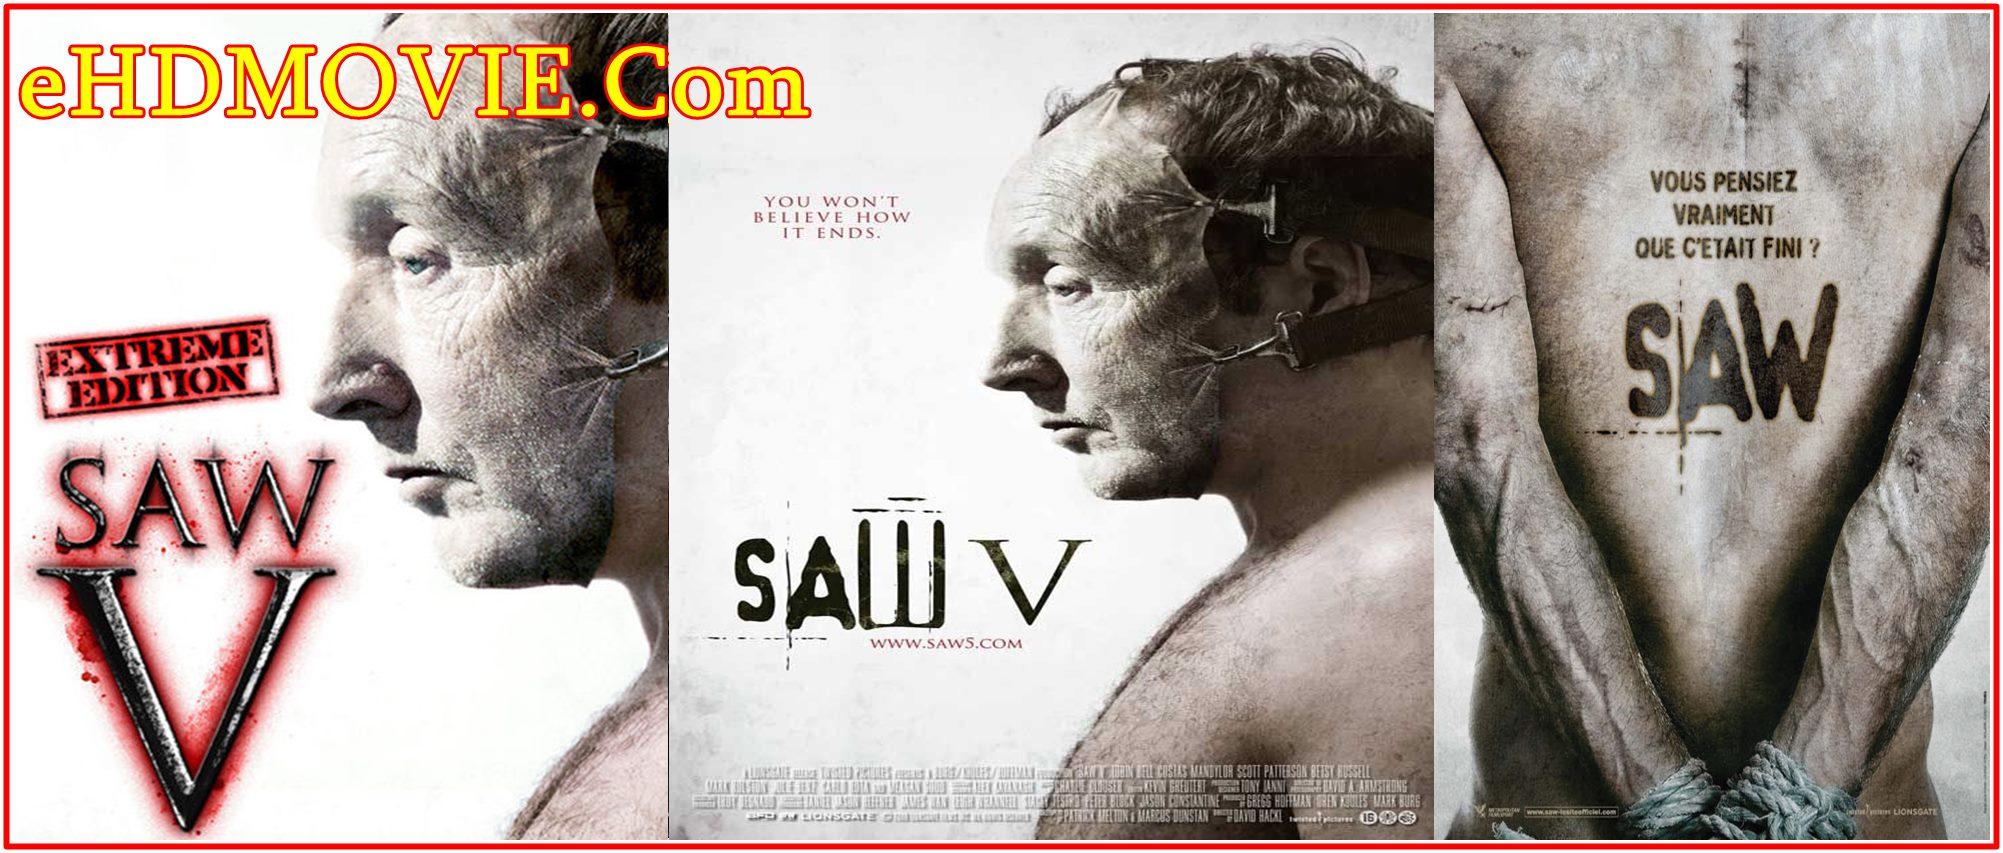 Saw V 2008 Full Movie English 720p – 480p ORG BRRip 350MB – 750MB ESubs Free Download